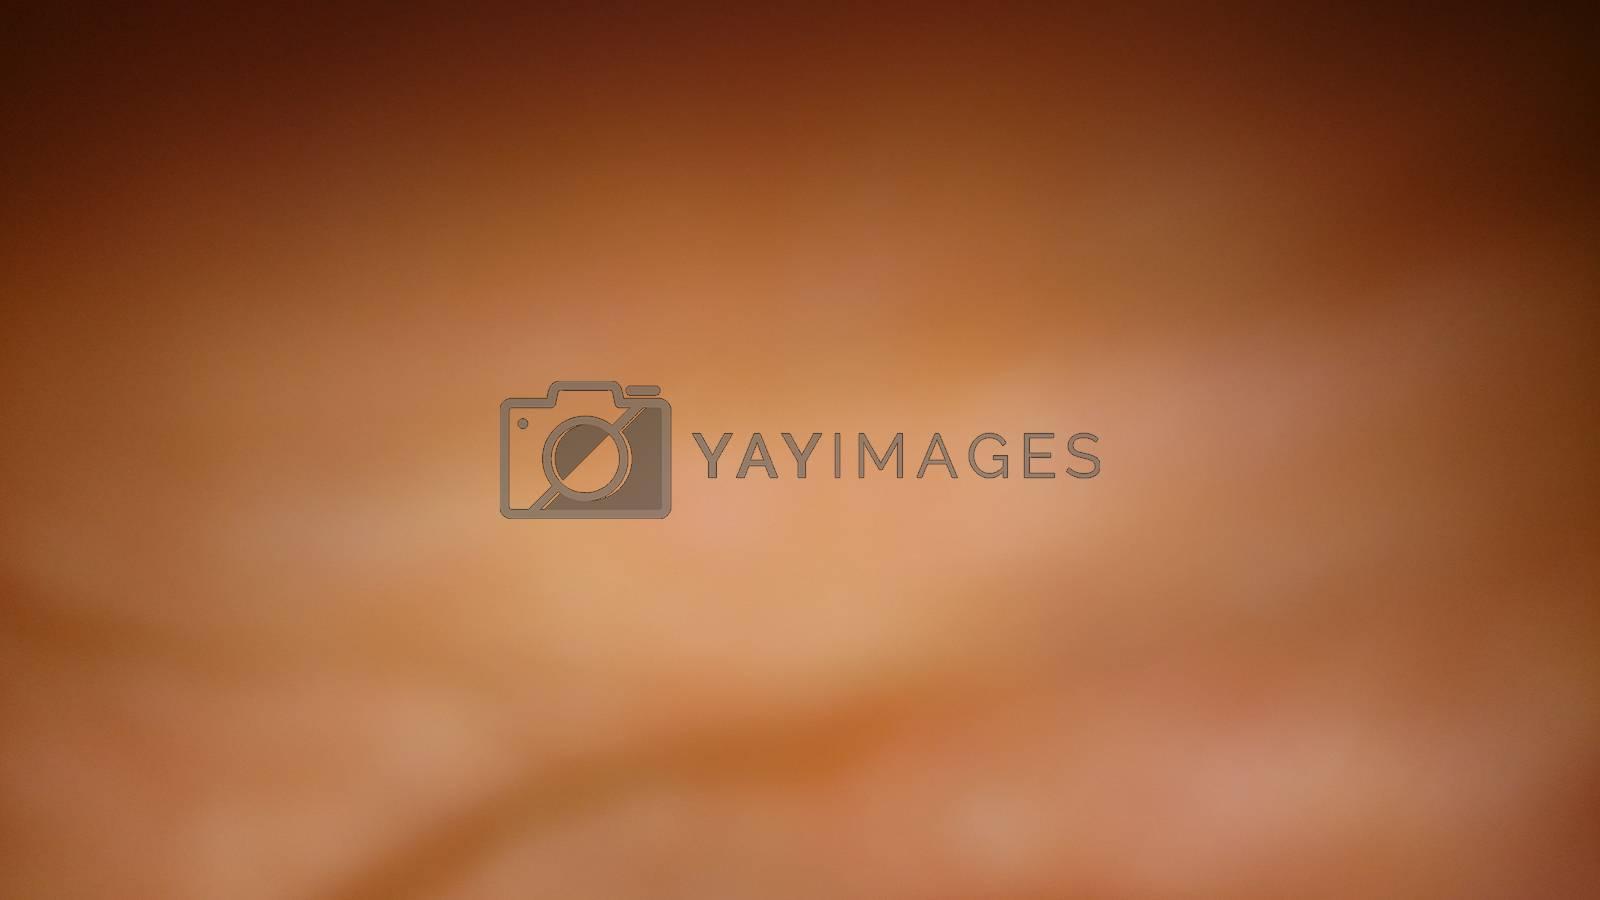 Defocused warm red and orange summer colors background